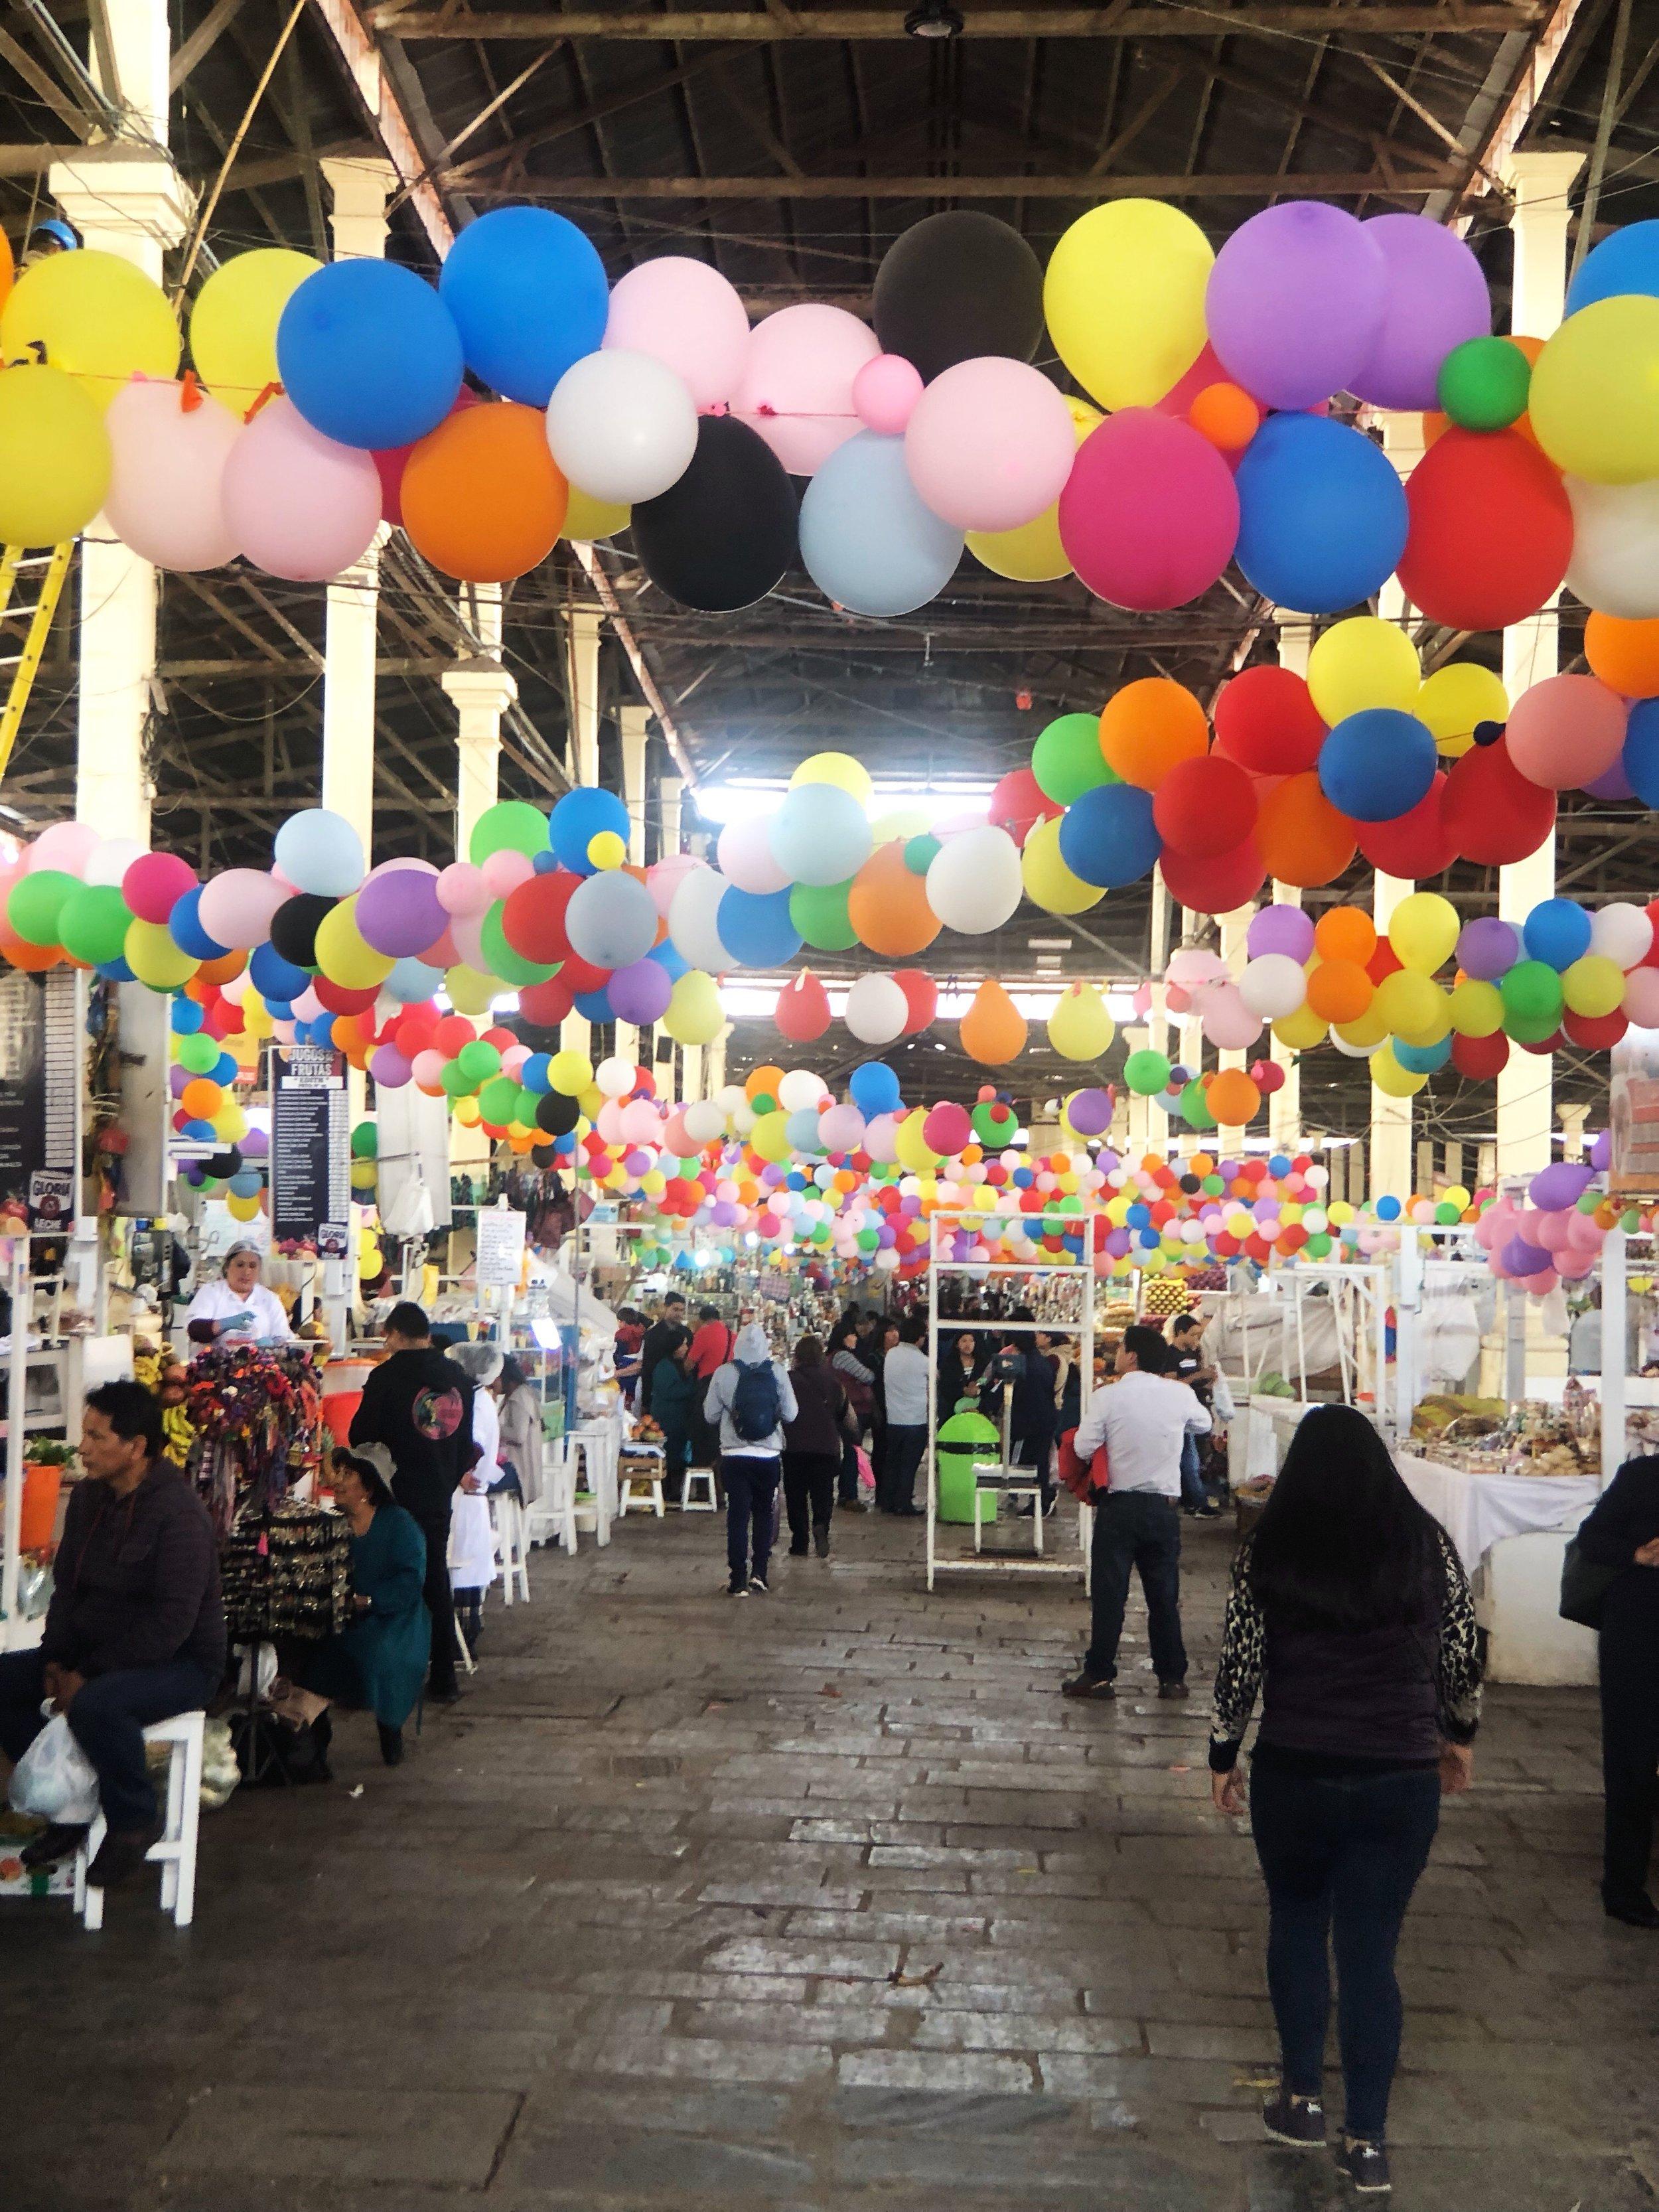 san pedro market-cusco-peru-shopping-food-textiles-south america- travel tips